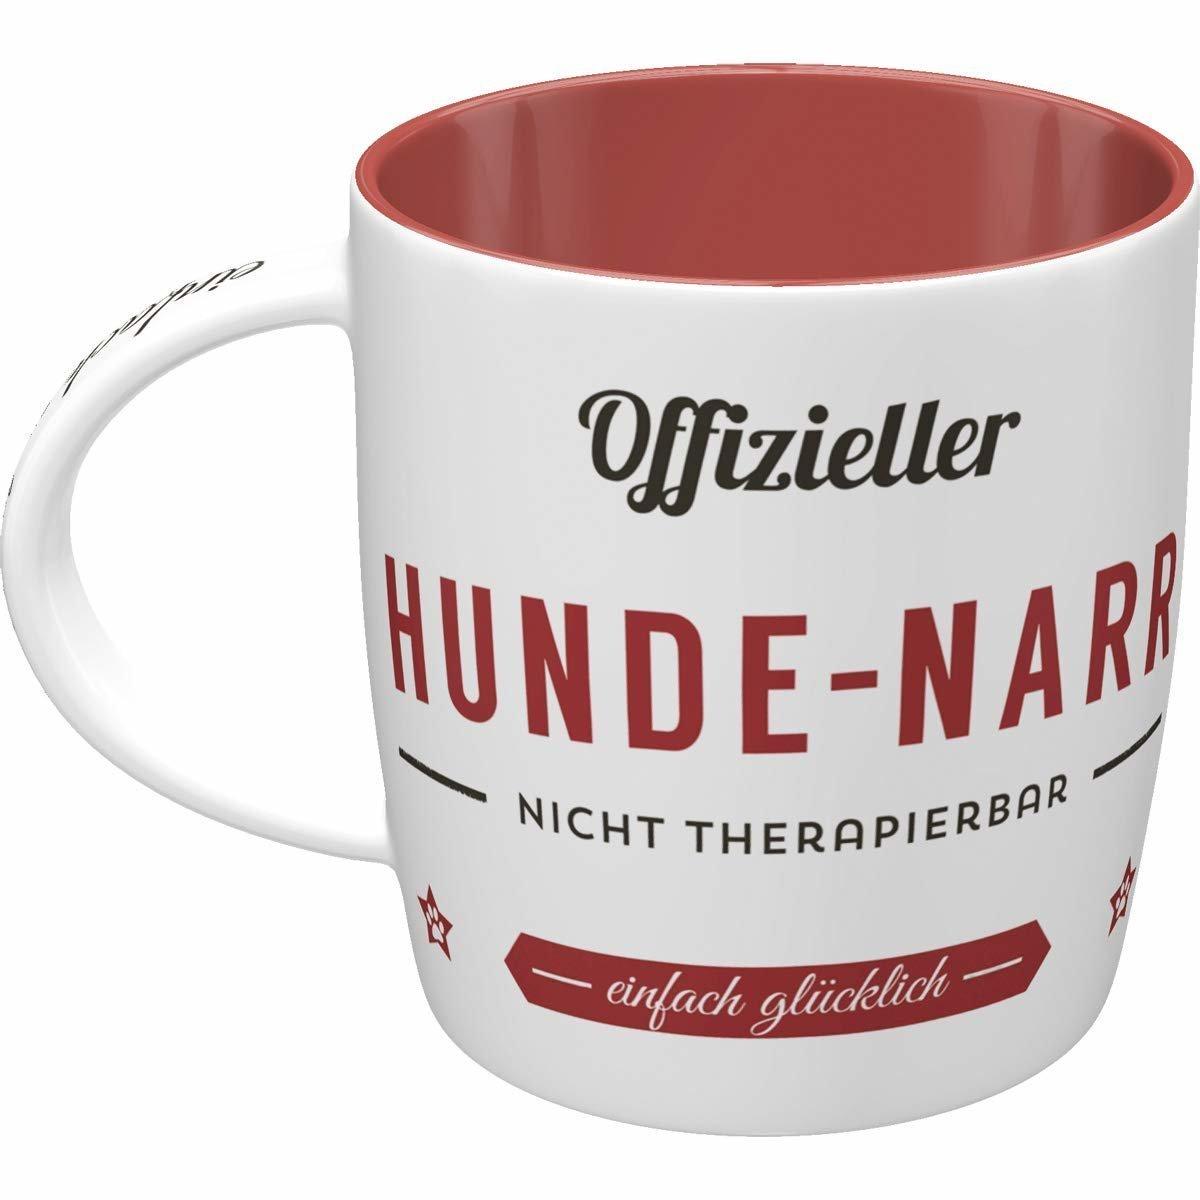 Nostalgic-Art Kaffee-Becher Hunde-Narr, Bild 5